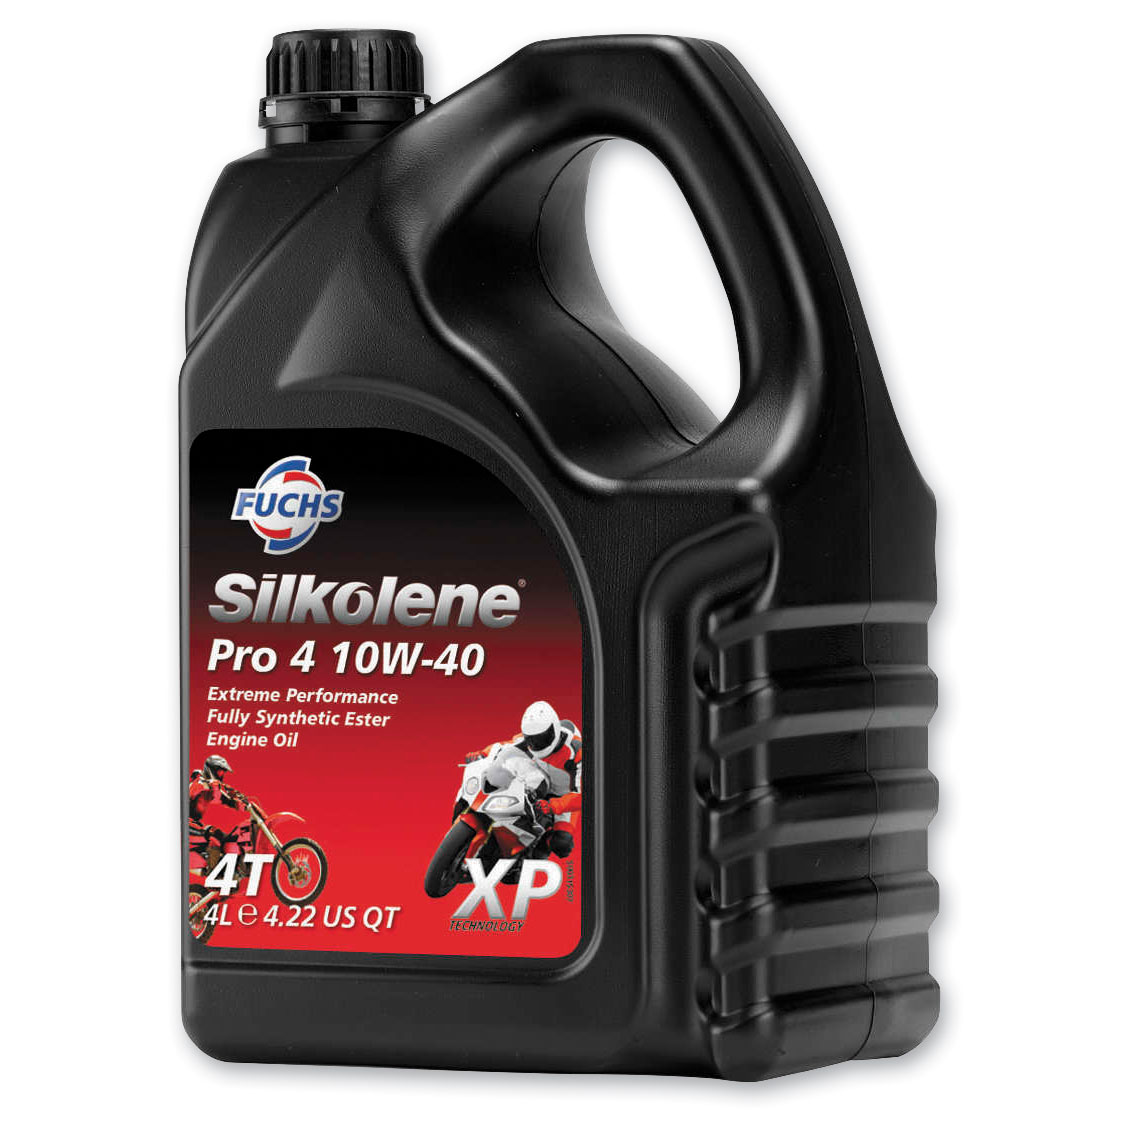 Silkolene Pro 4 XP 10W40 Engine Oil 4L